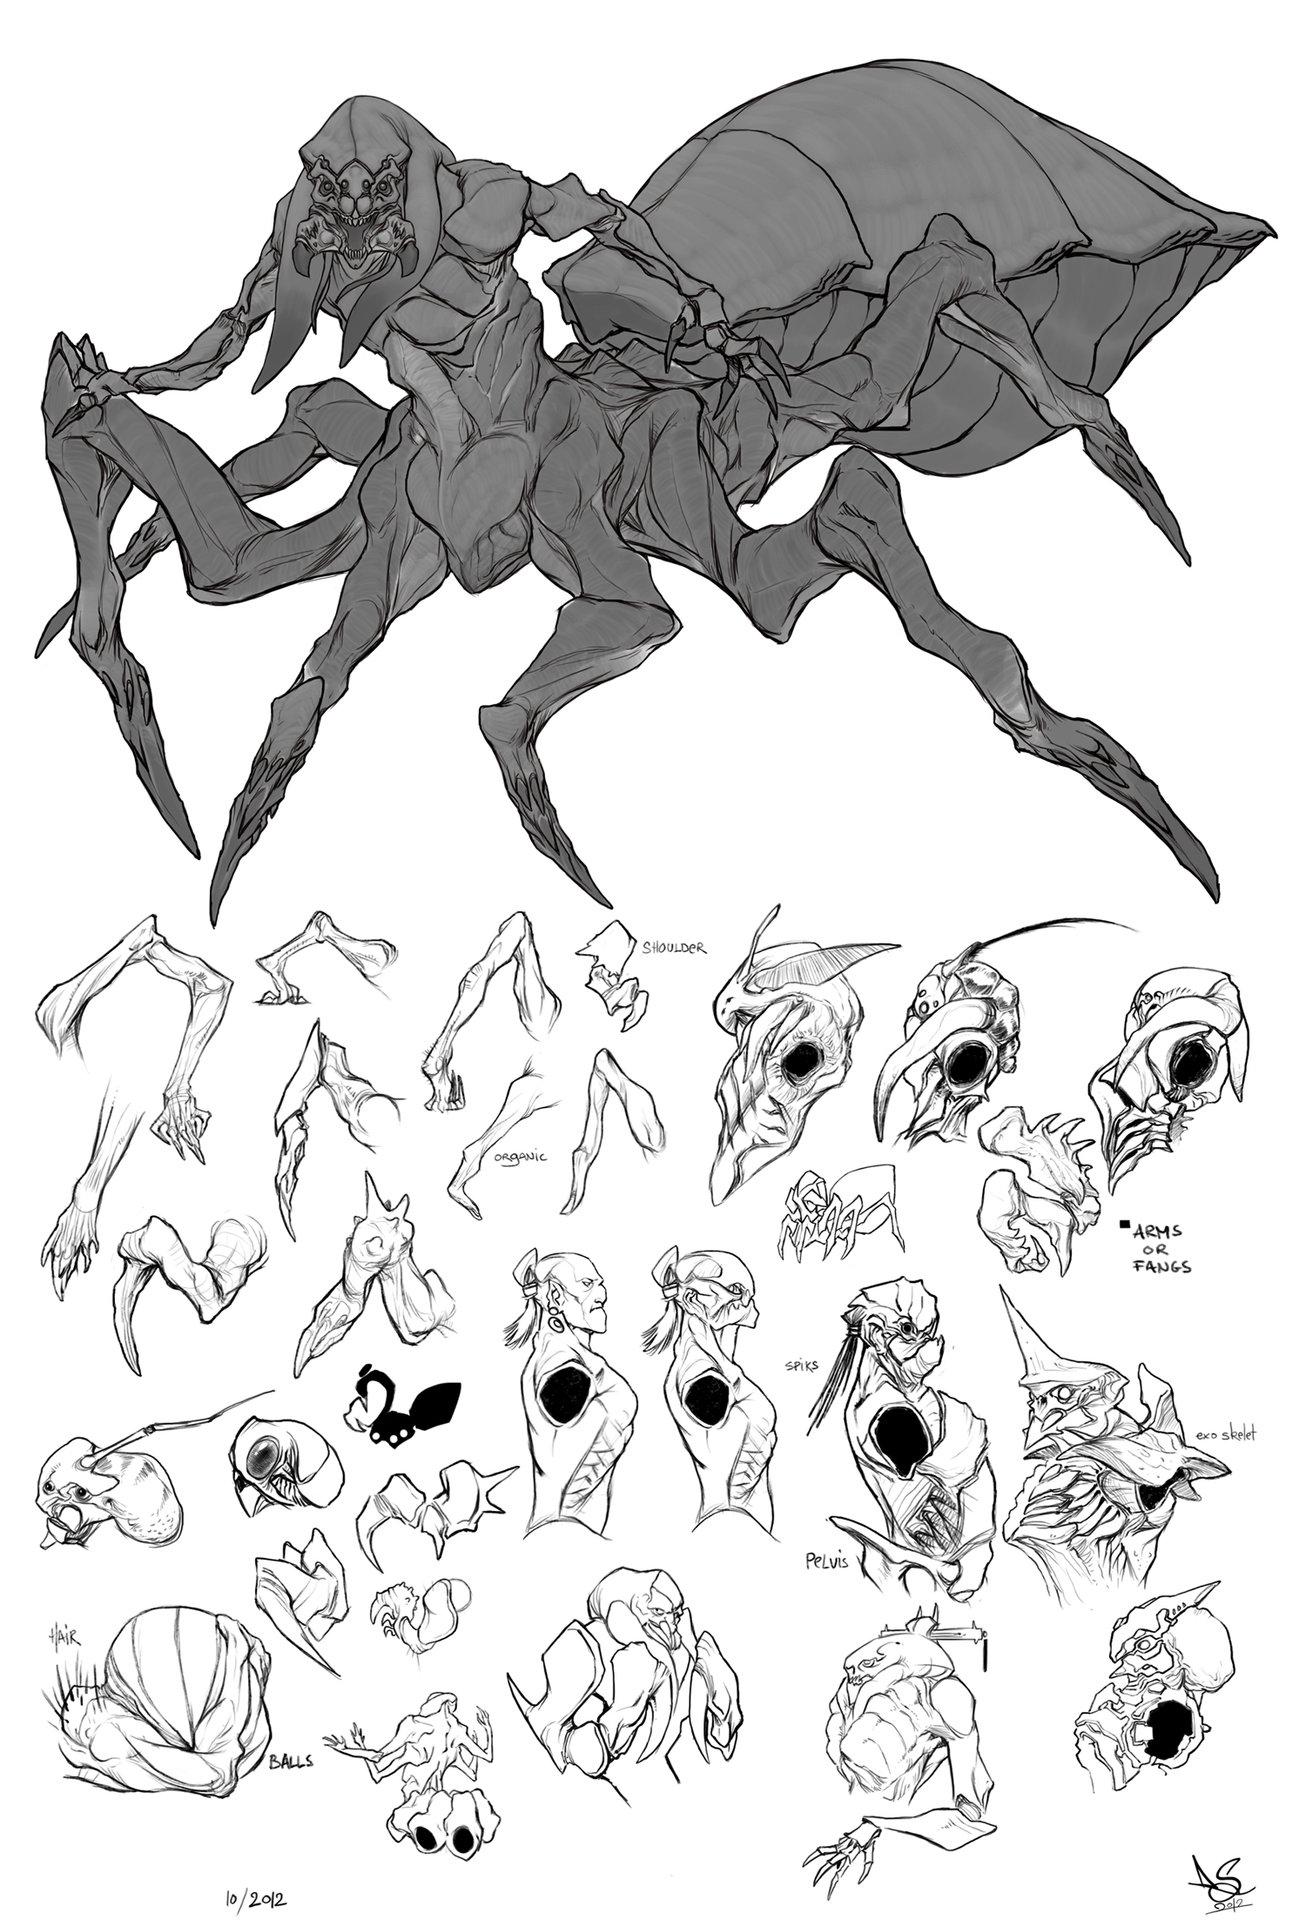 david-sequeira-spiderman